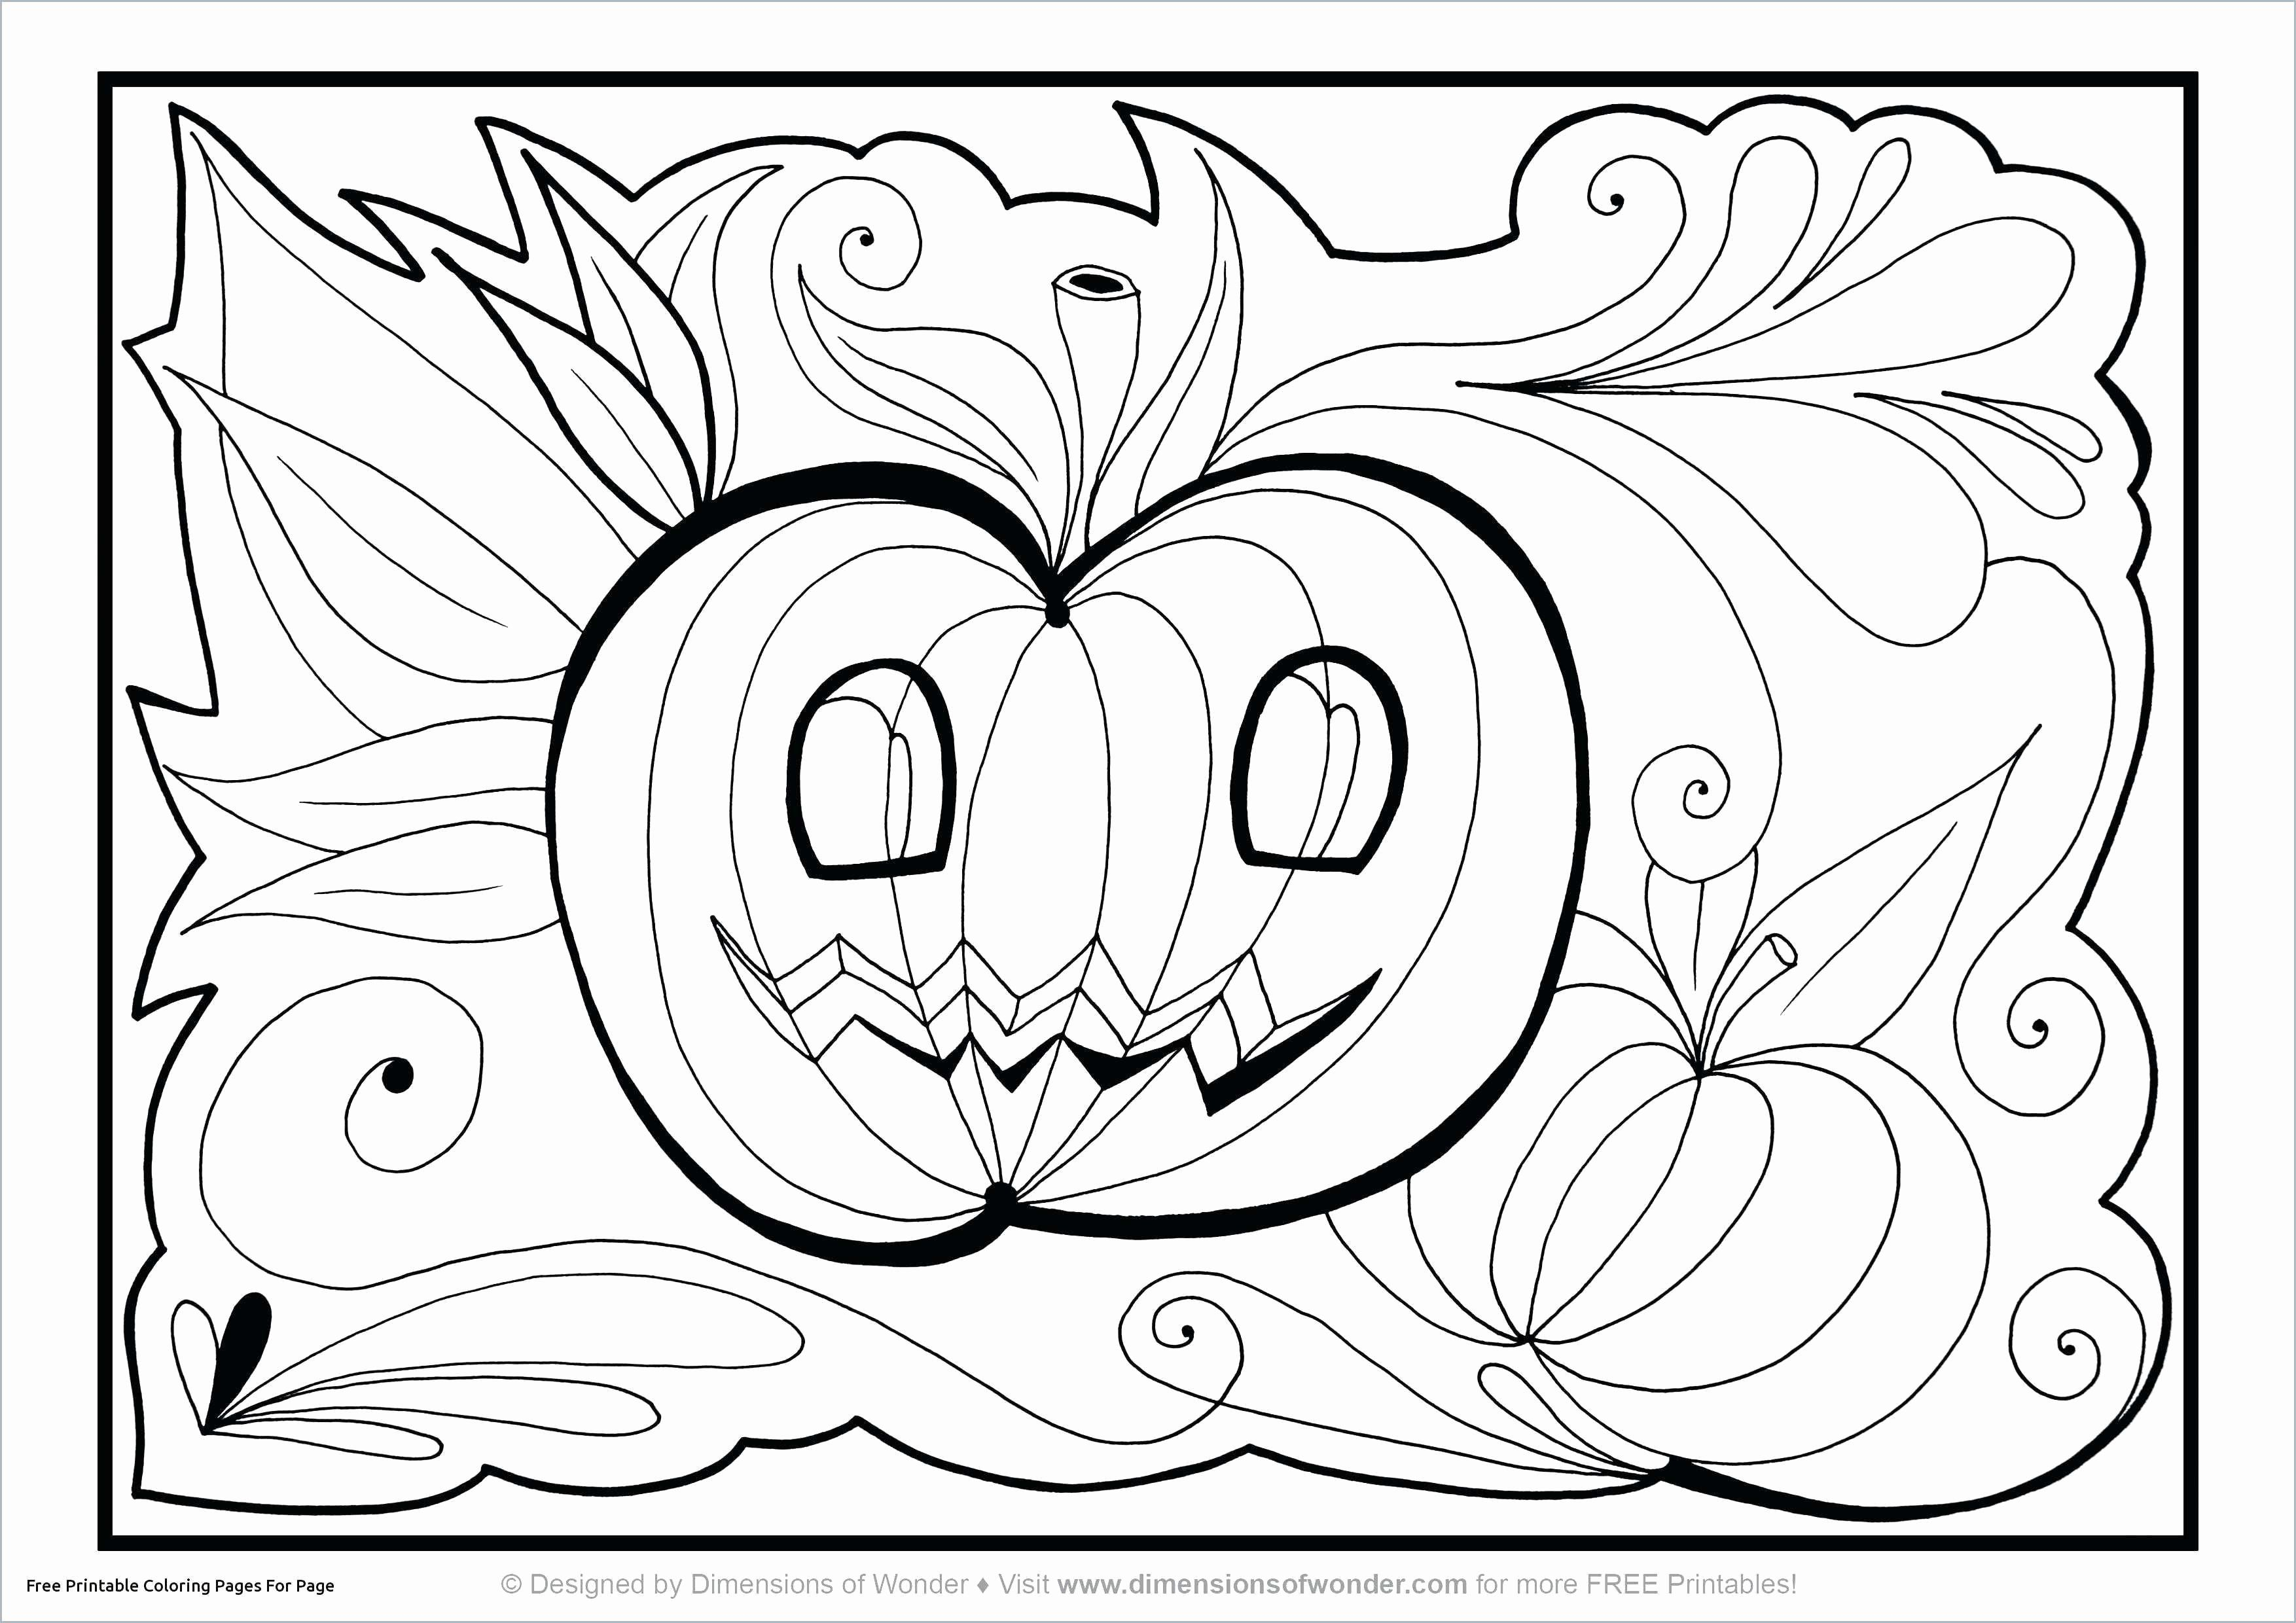 Print A Coloring Page Best Of Elegant Print Cool Coloring Pages Sirclaymelon Halaman Mewarnai Bunga Halaman Mewarnai Buku Mewarnai